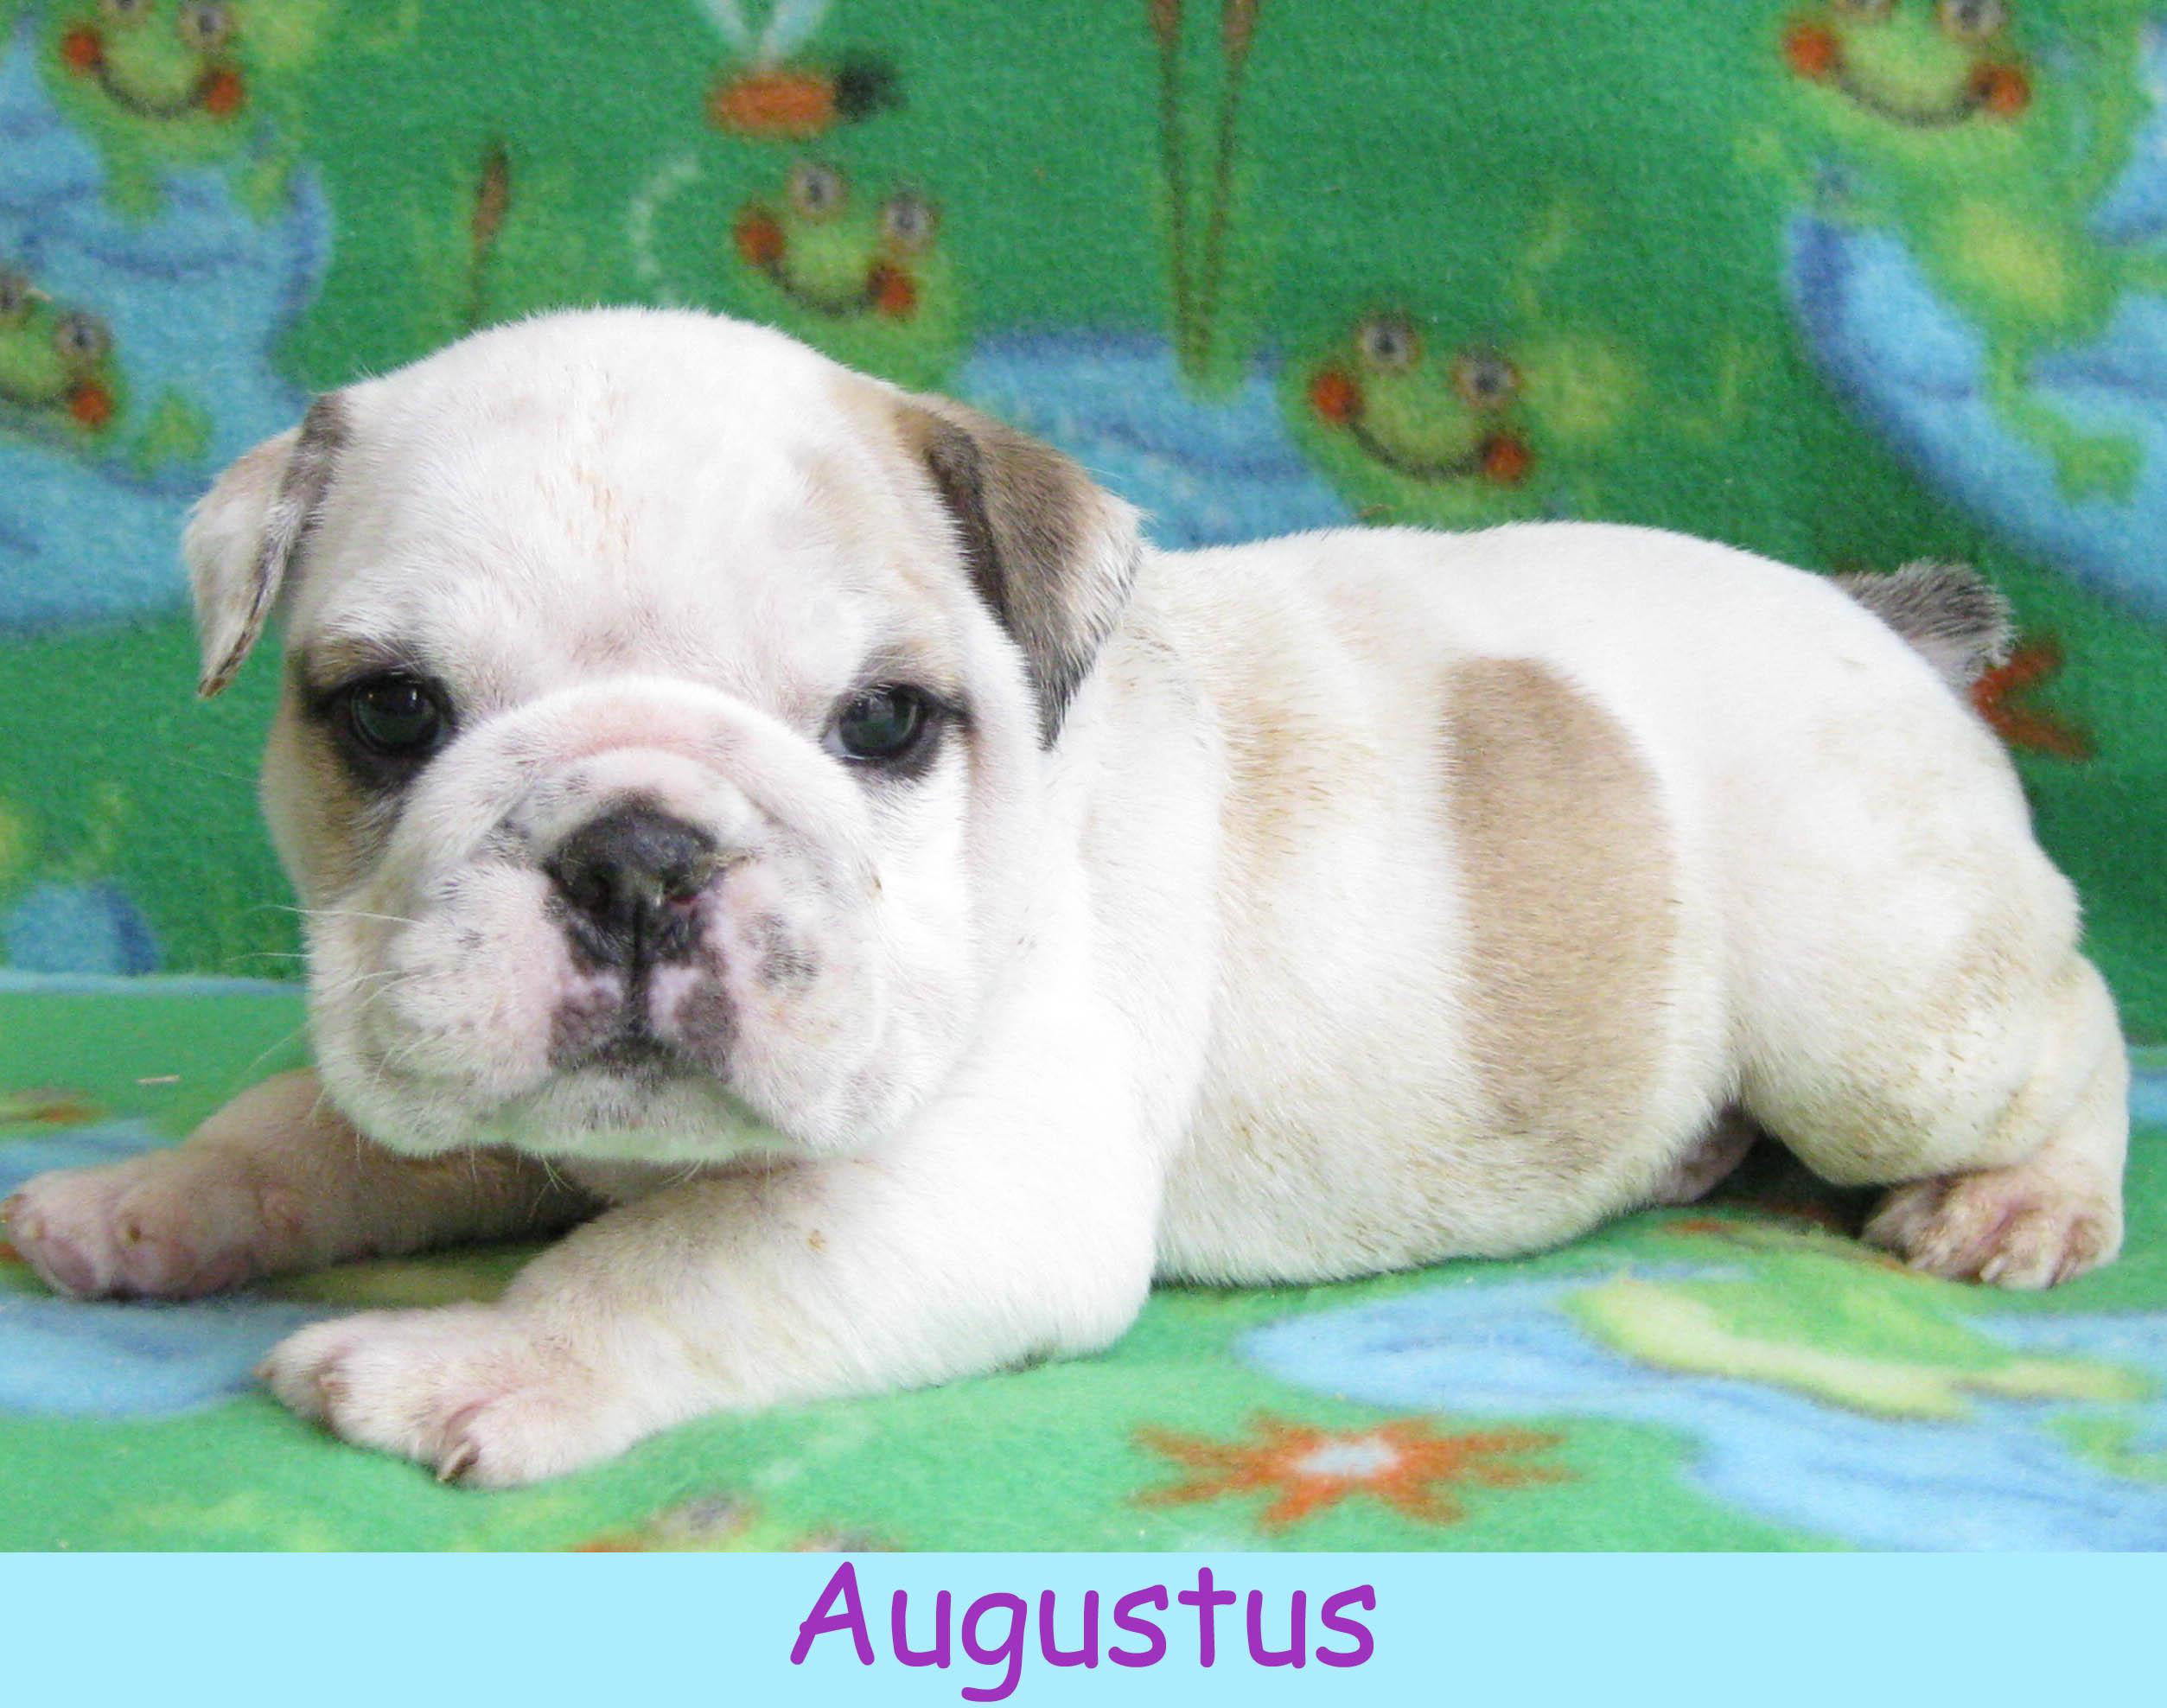 maugustus1214.jpg